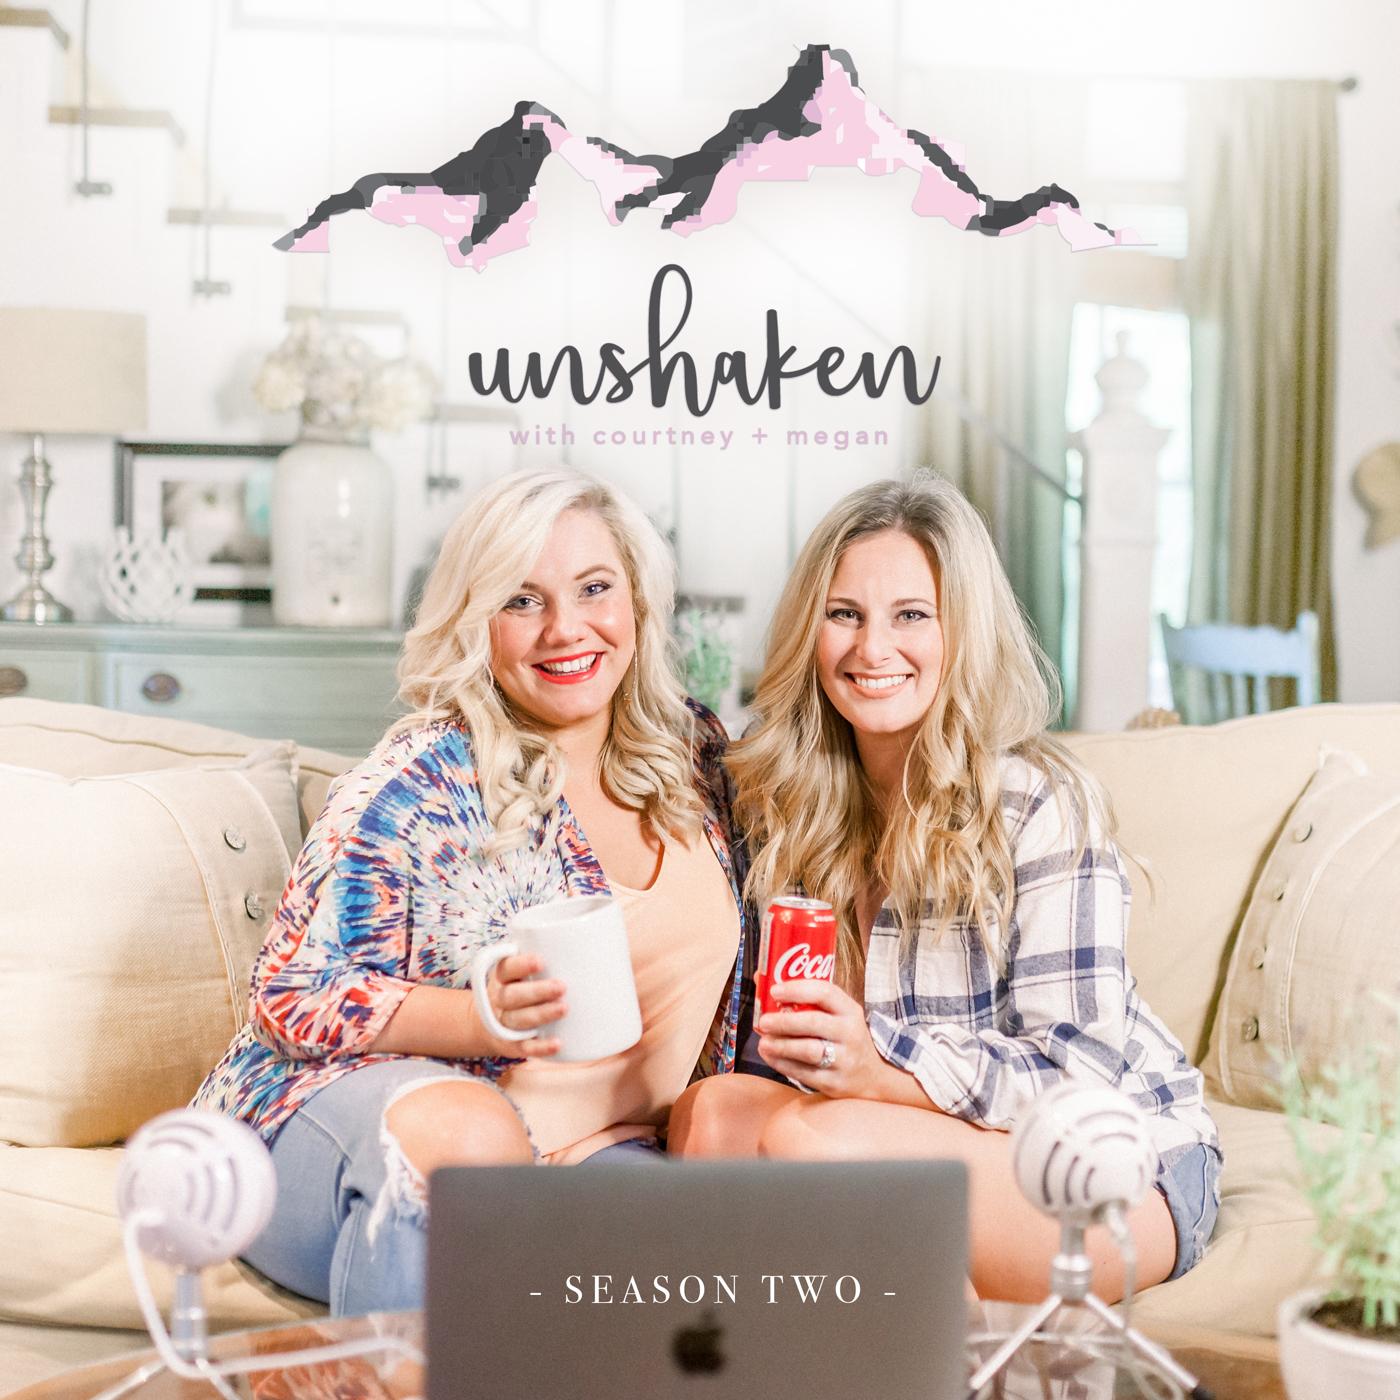 Unshaken Podcast Season Two